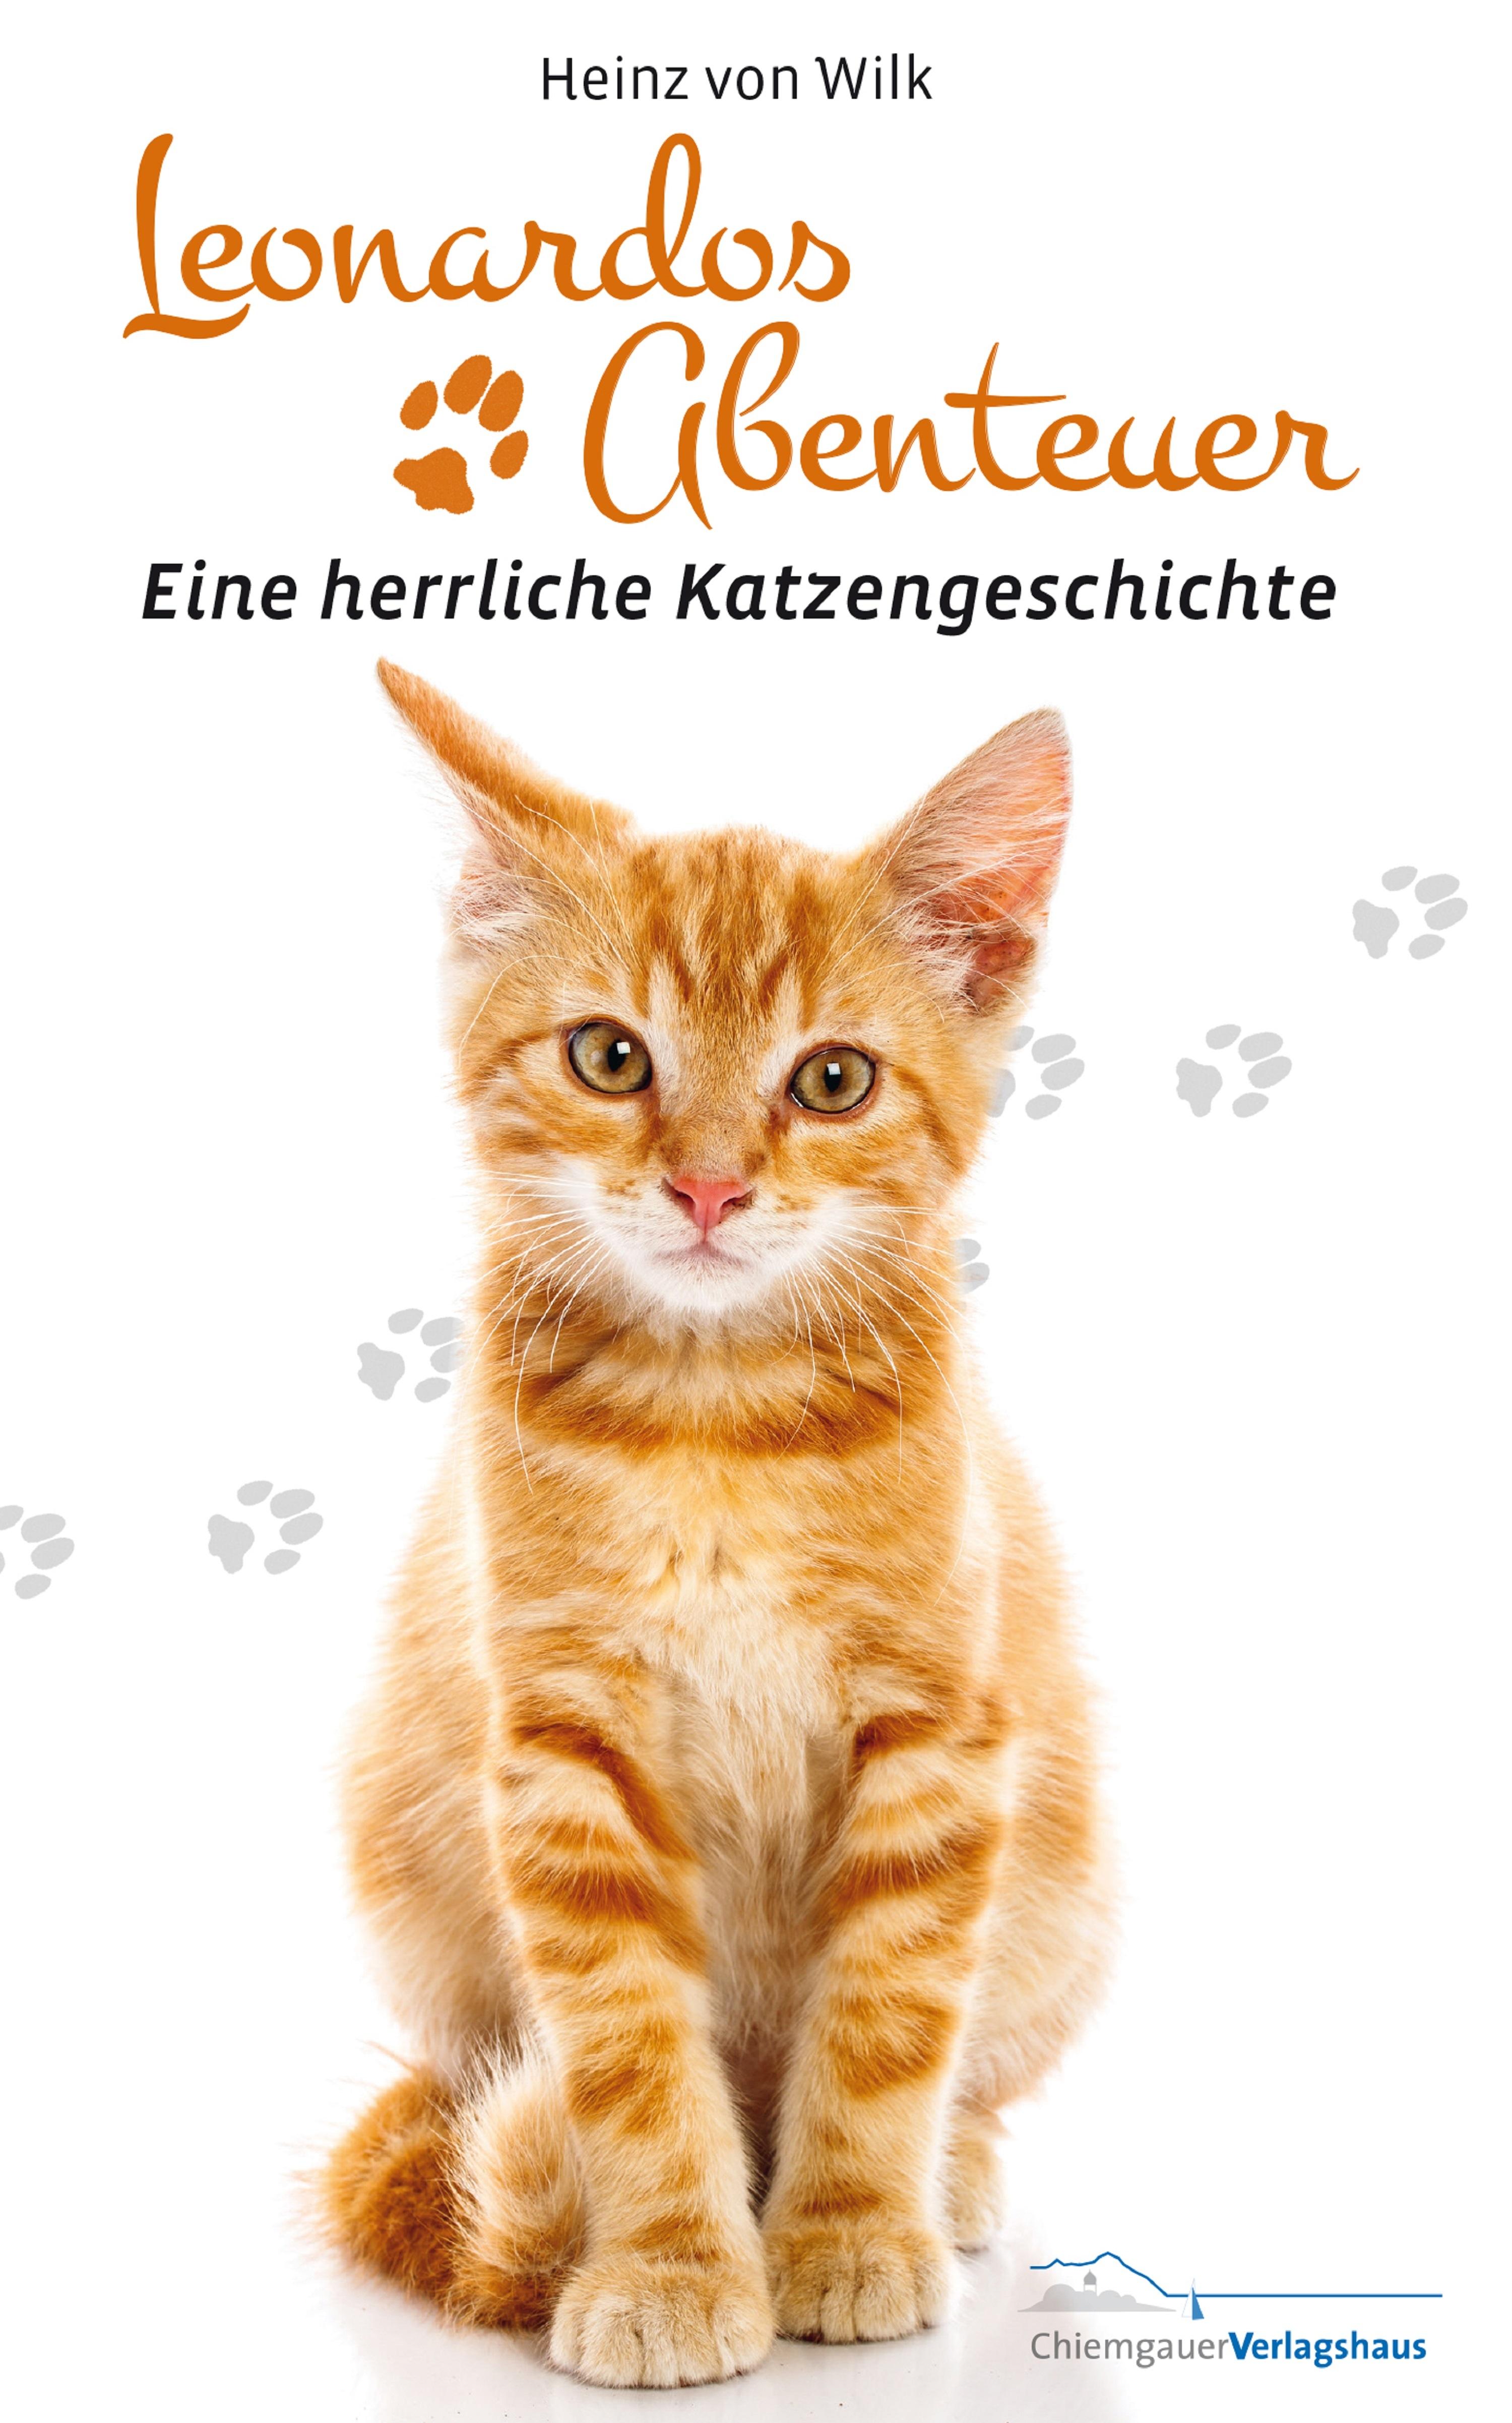 цена Heinz von Wilk Leonardos Abenteuer онлайн в 2017 году